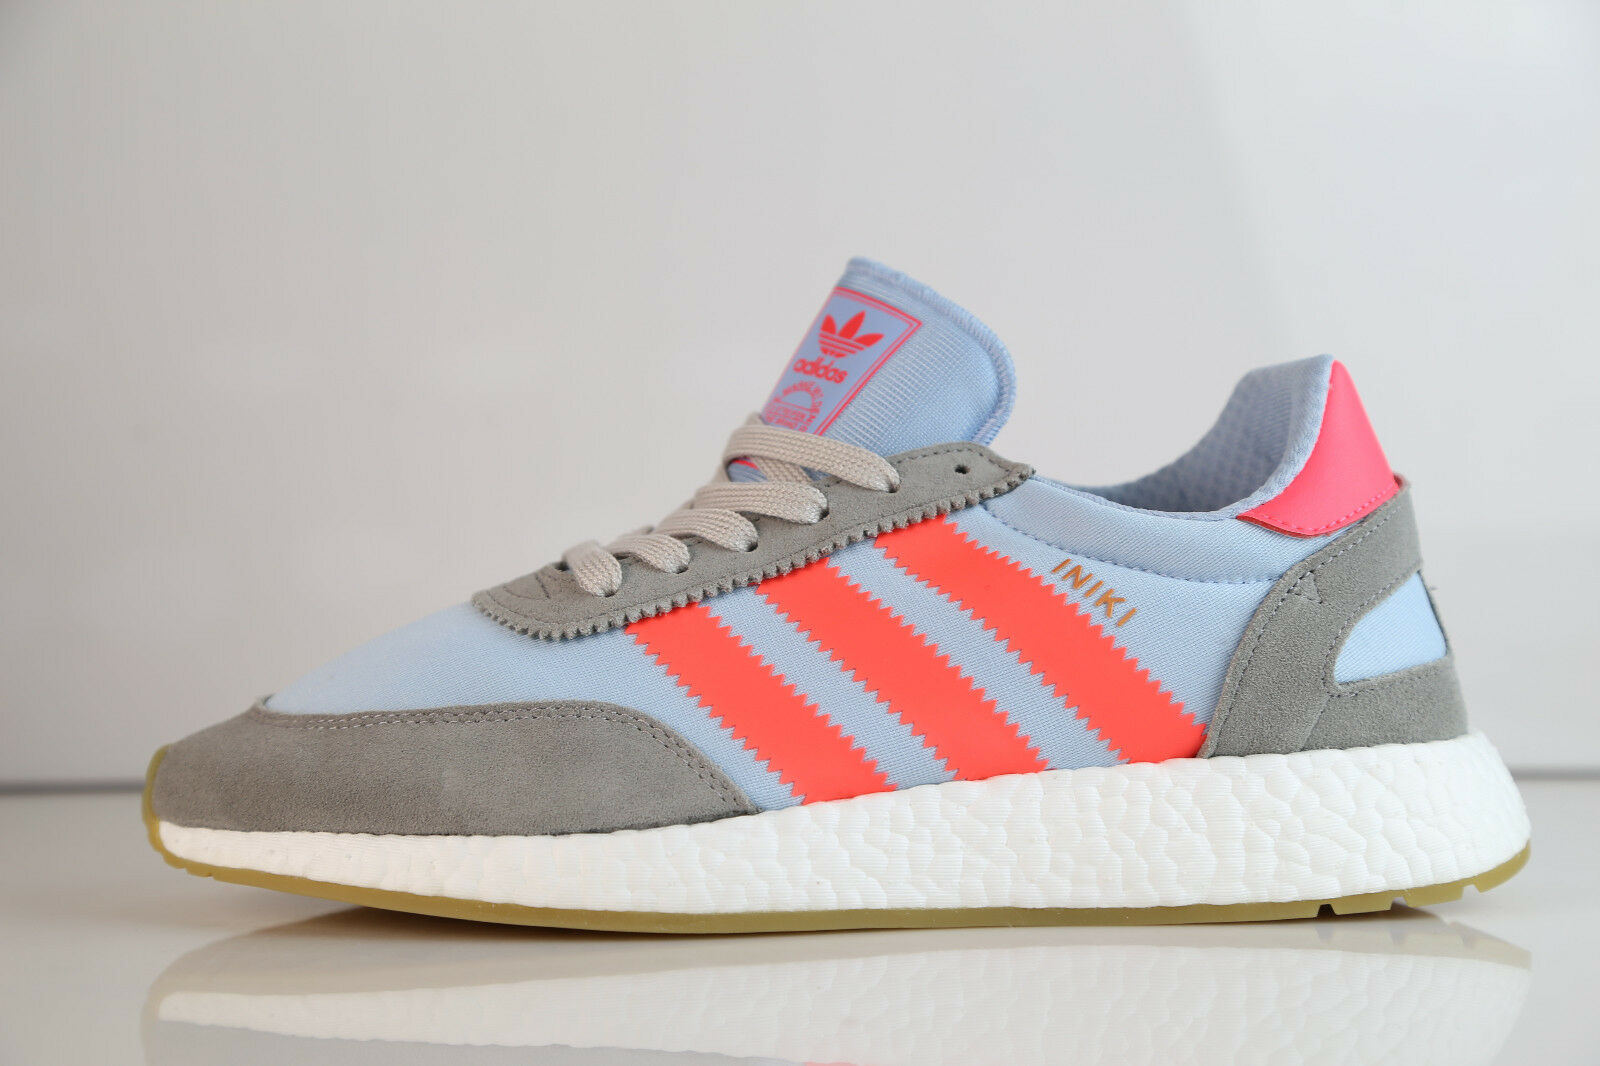 Adidas Boost Boost Boost Iniki Runner grigio Turbo Gum BB2098 8.5-12 ultra suede originals 1afca5